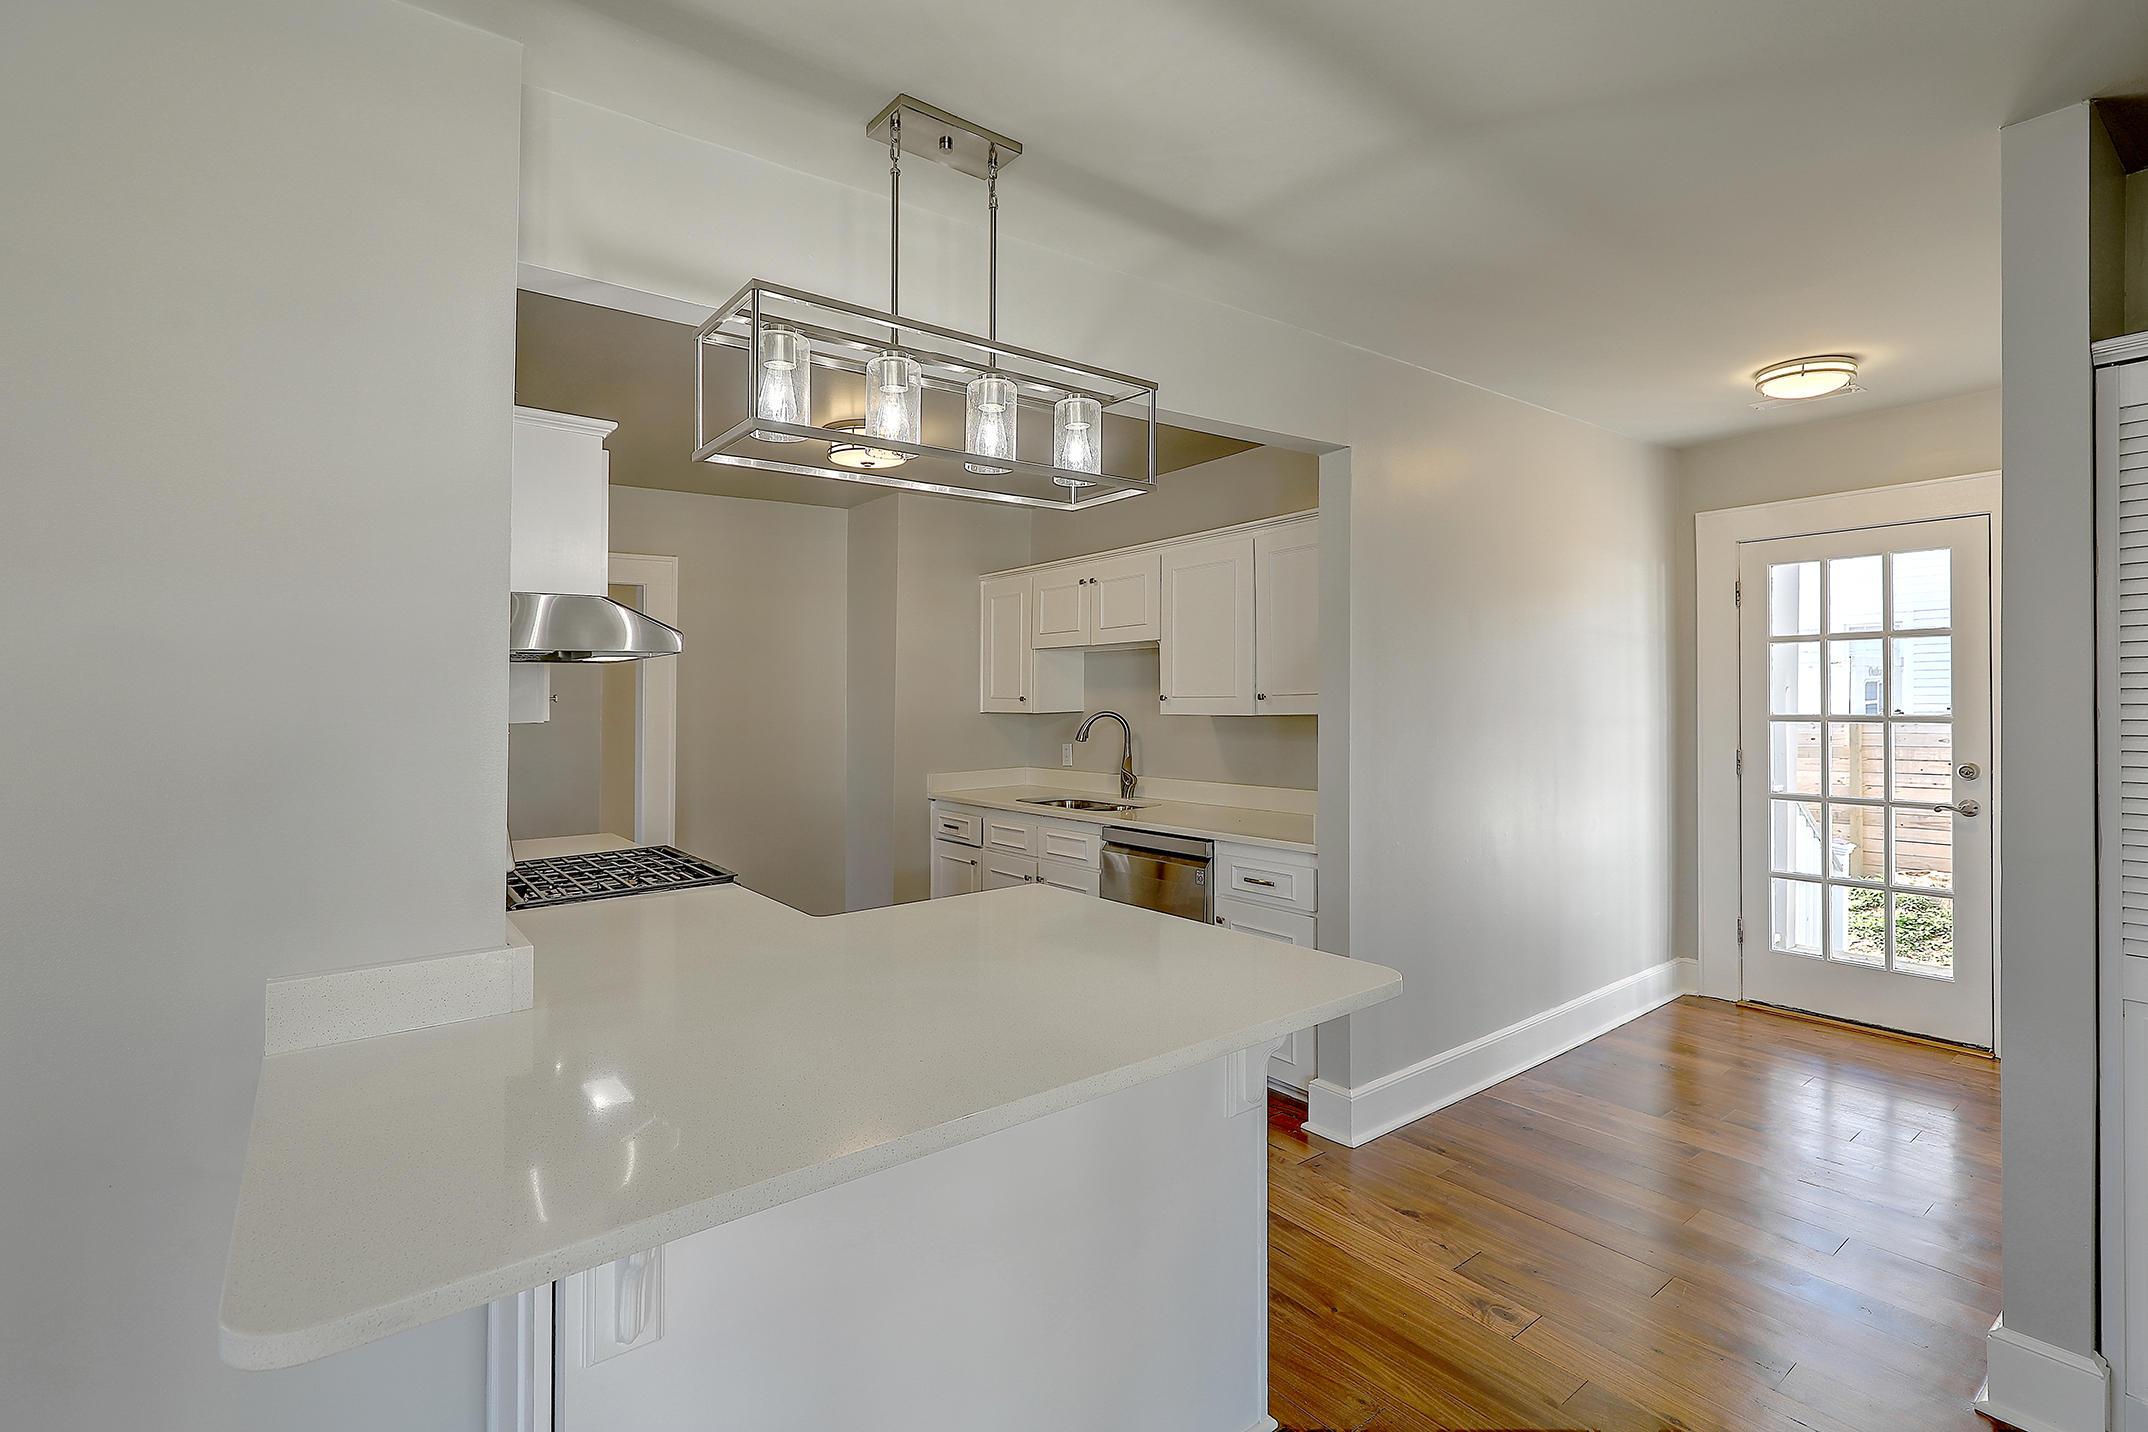 Riverland Terrace Homes For Sale - 2166 St James, Charleston, SC - 2